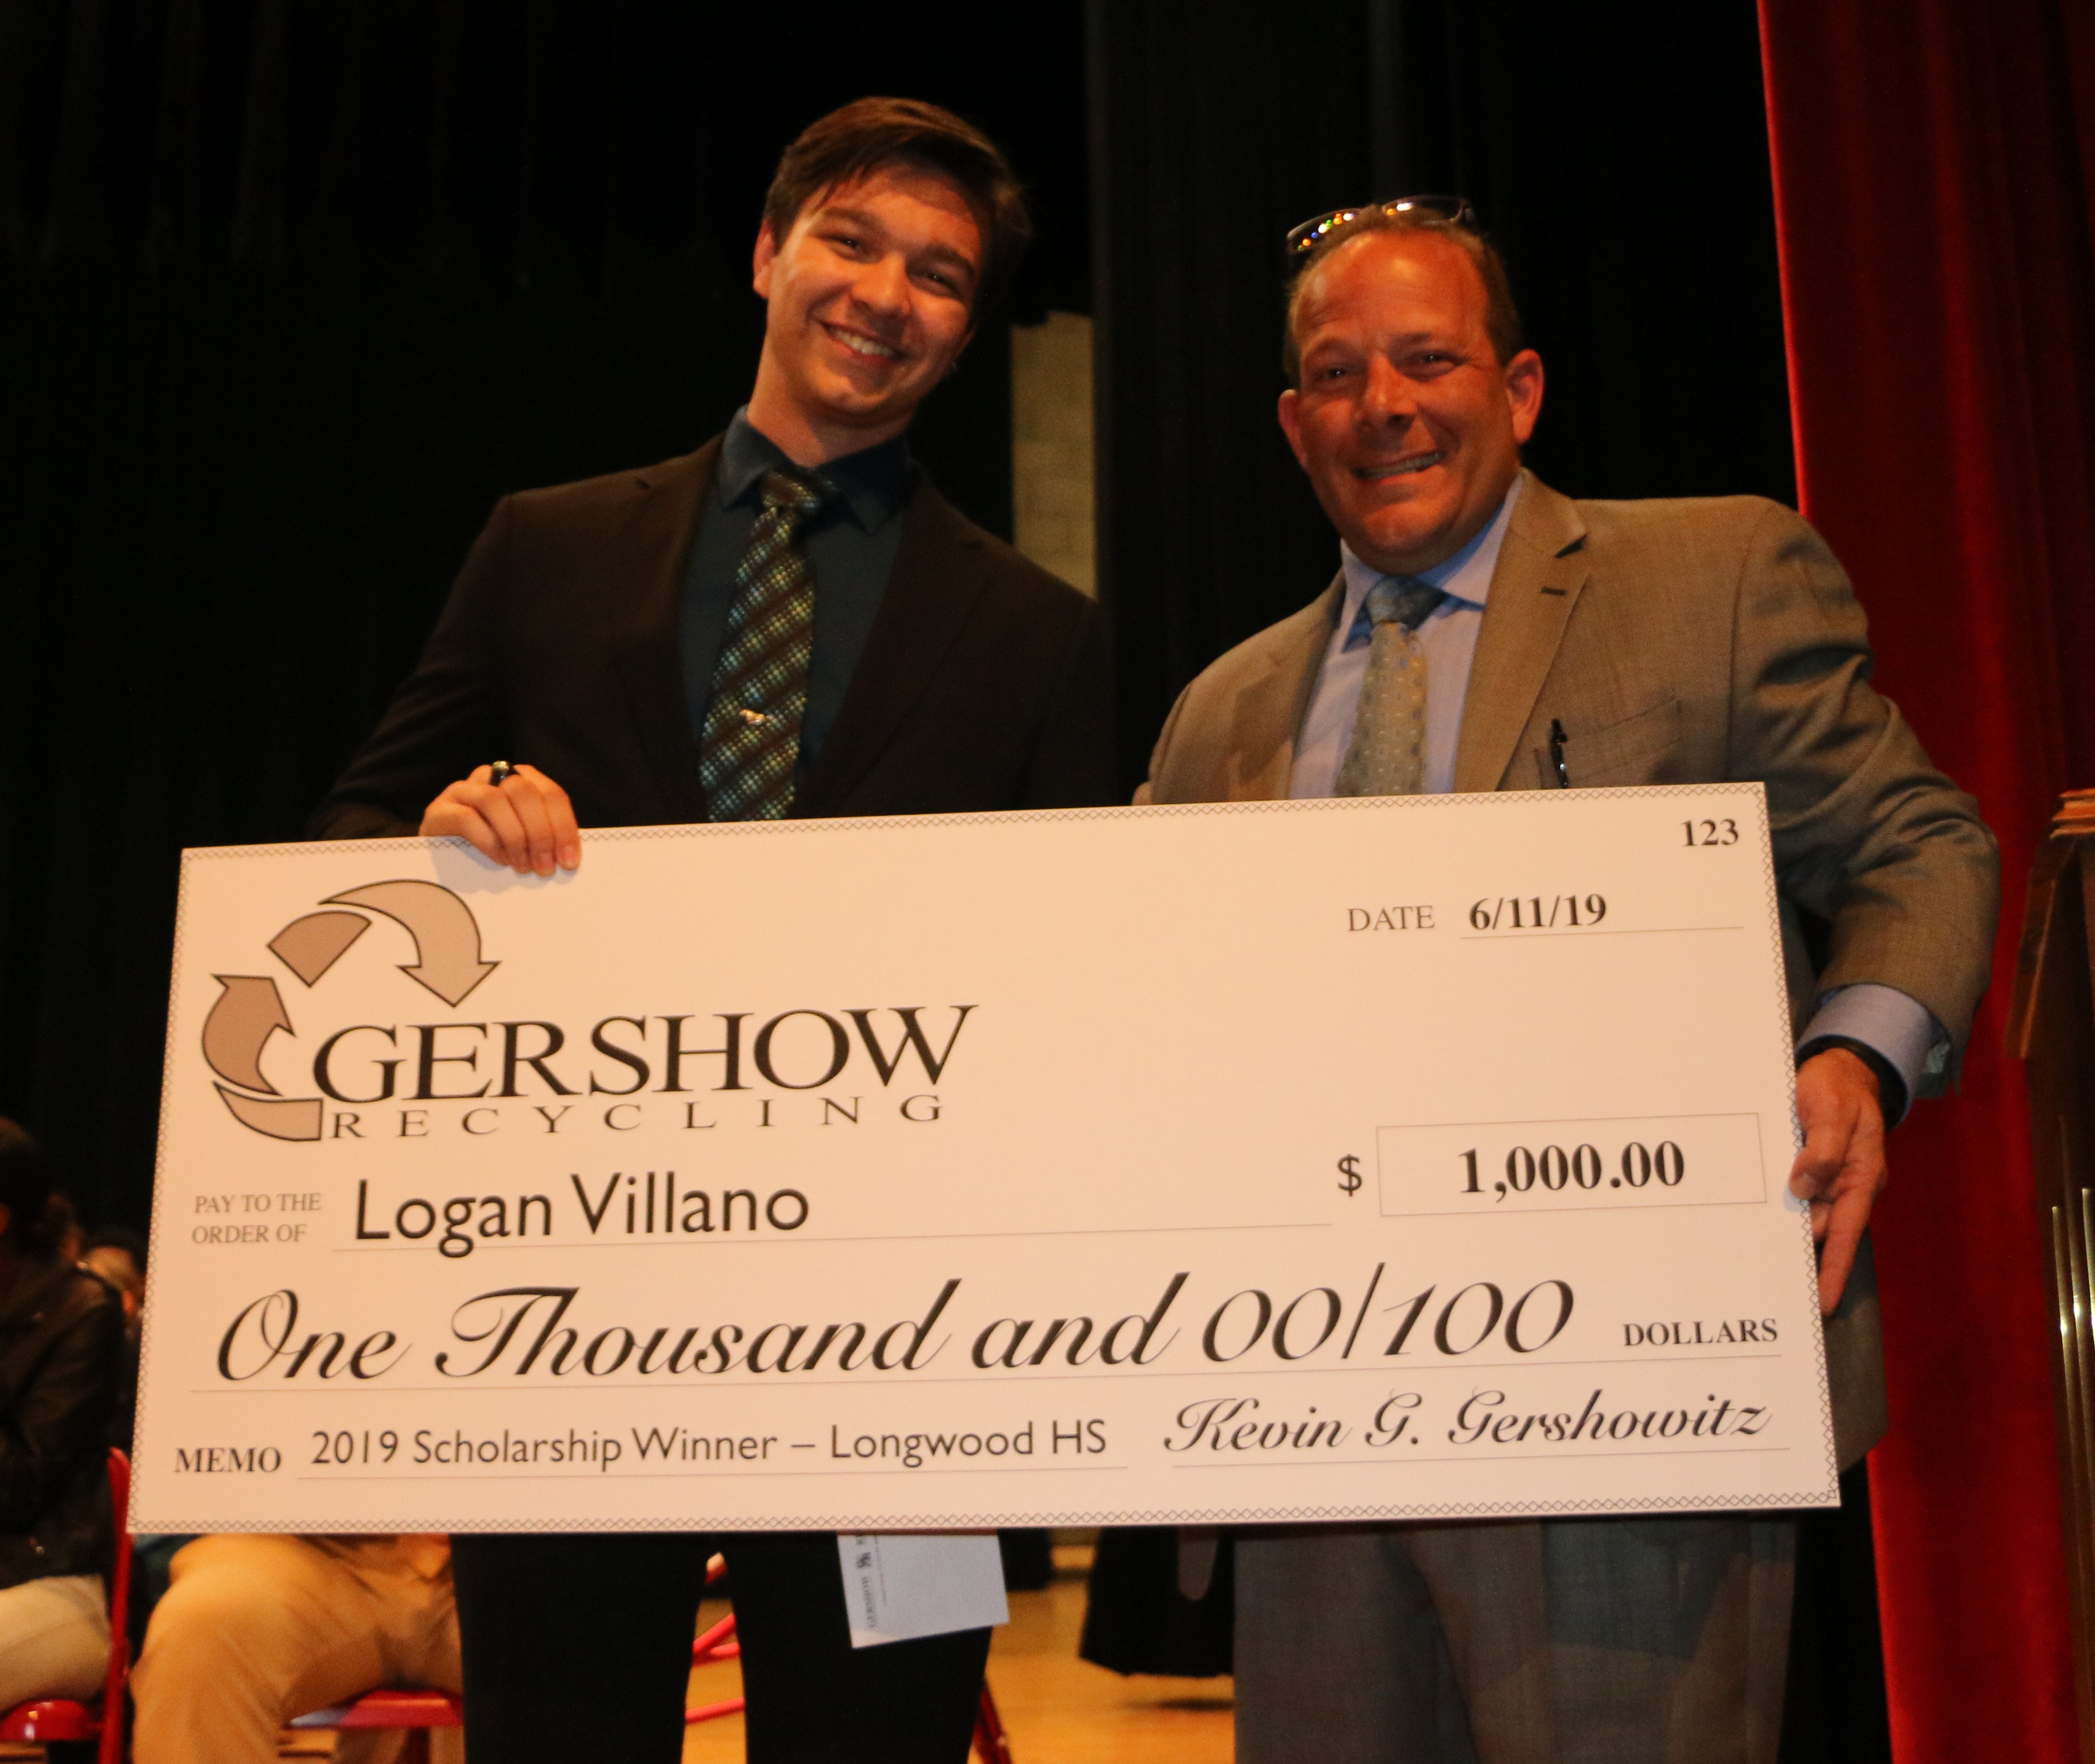 , Gershow Recycling Grants Environmental Conservation Scholarship to Longwood High School Graduating Senior Logan Villano